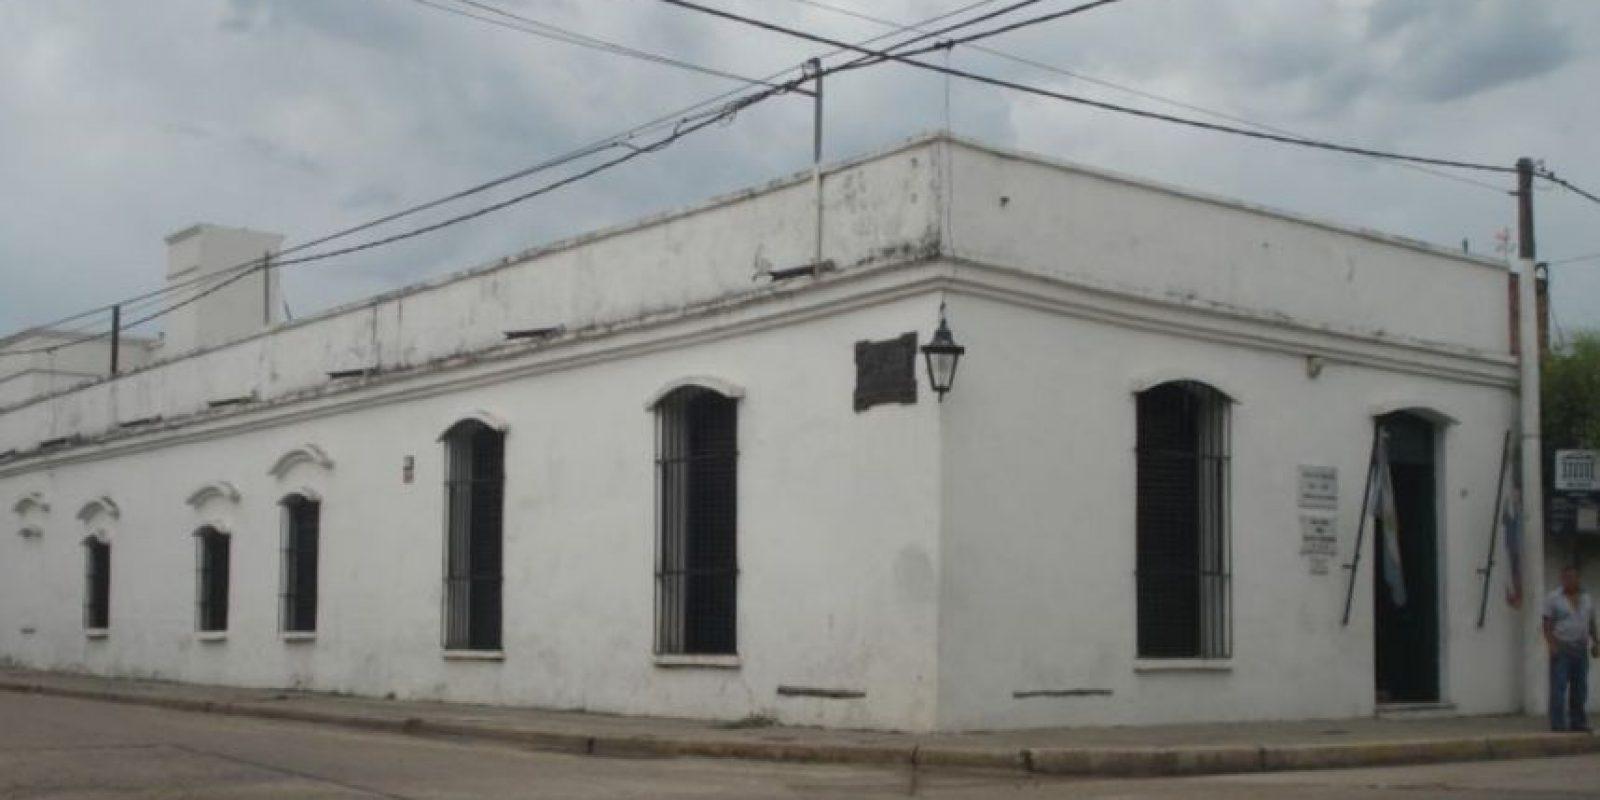 Casa de Haedo (Argentina) Foto:iltechnologies